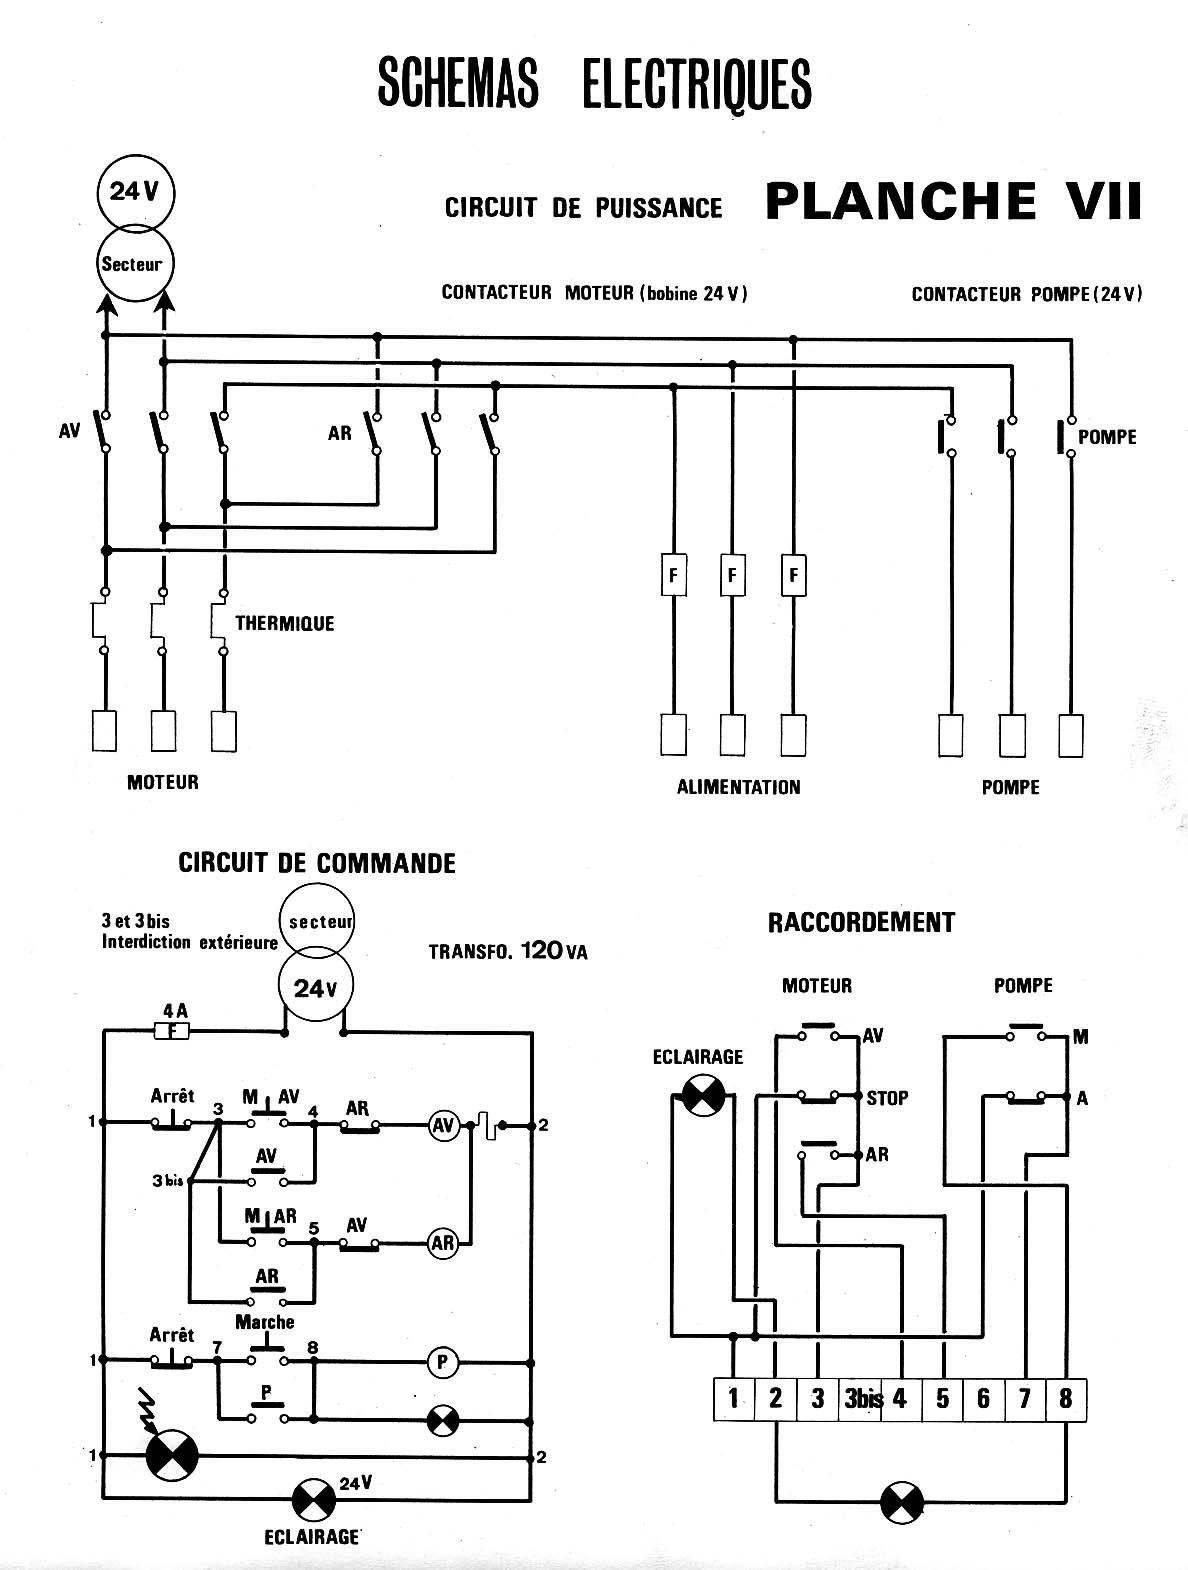 schéma electri socomo.jpg